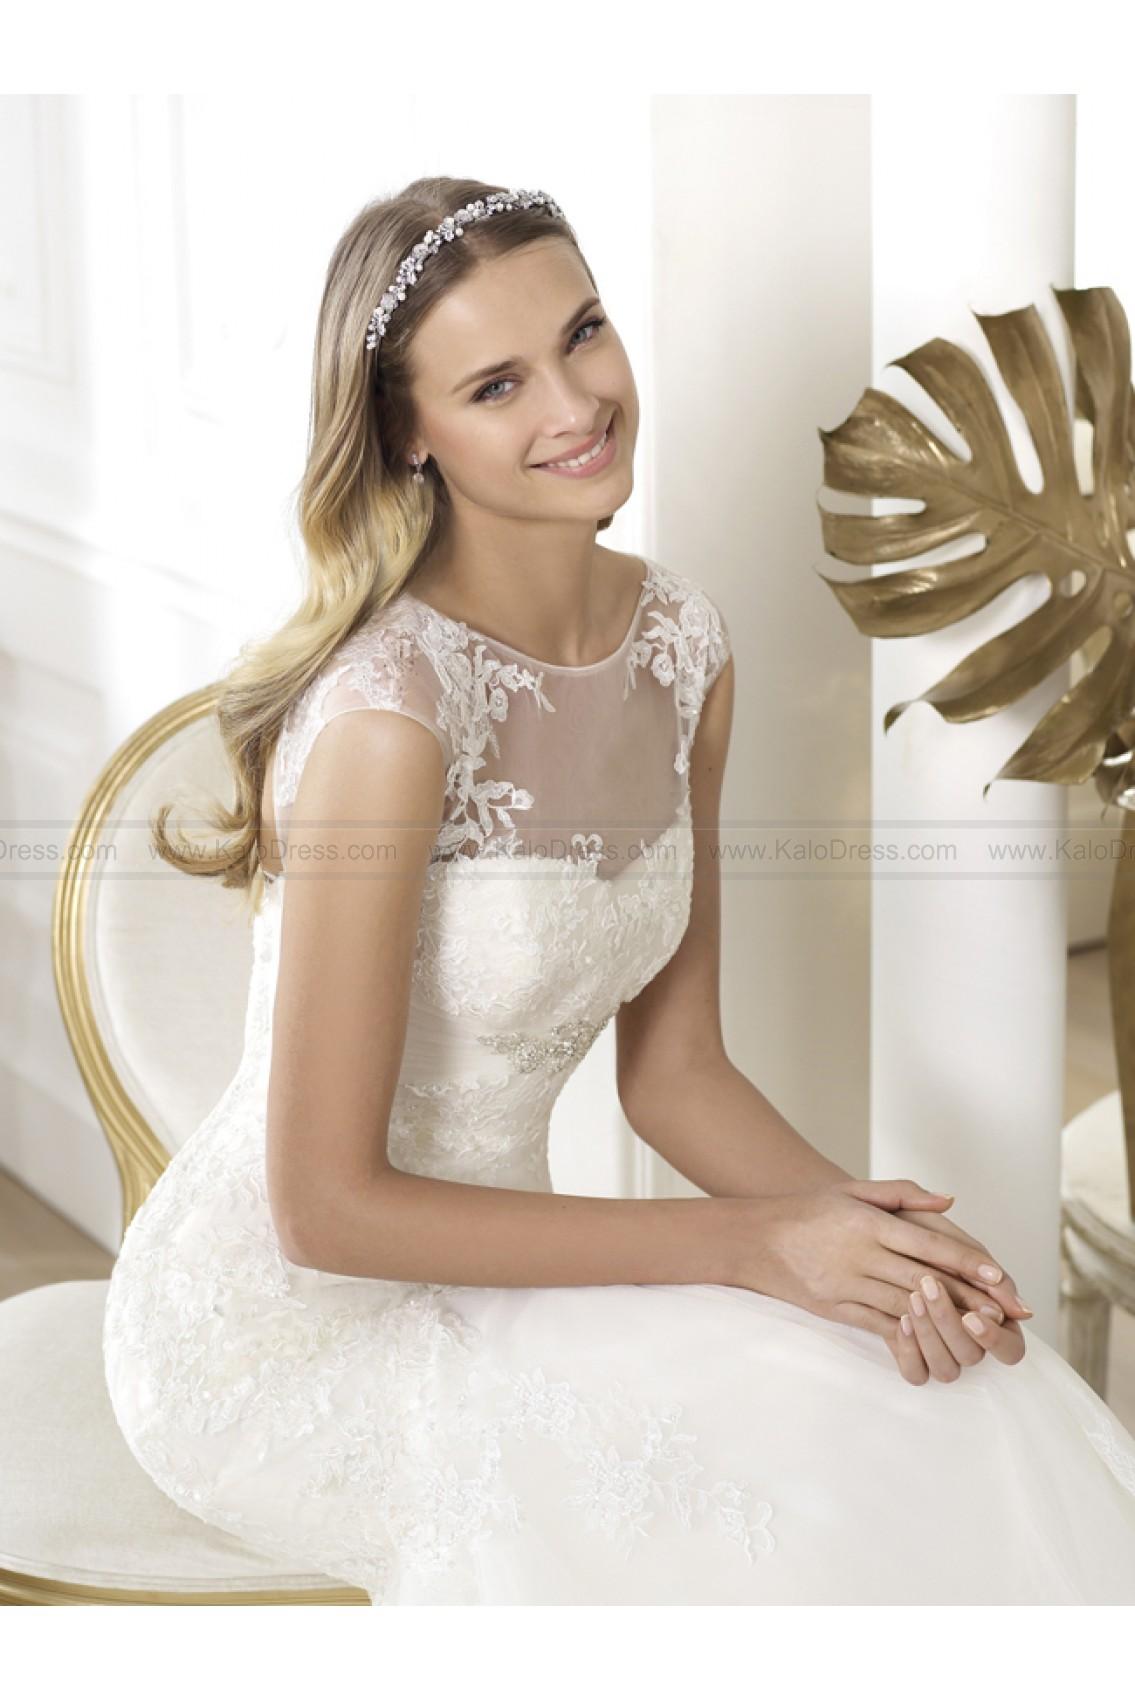 Pronovias Wedding Dresses - Style Leonde - Wedding Dresses 2014 New - Formal Wedding Dresses